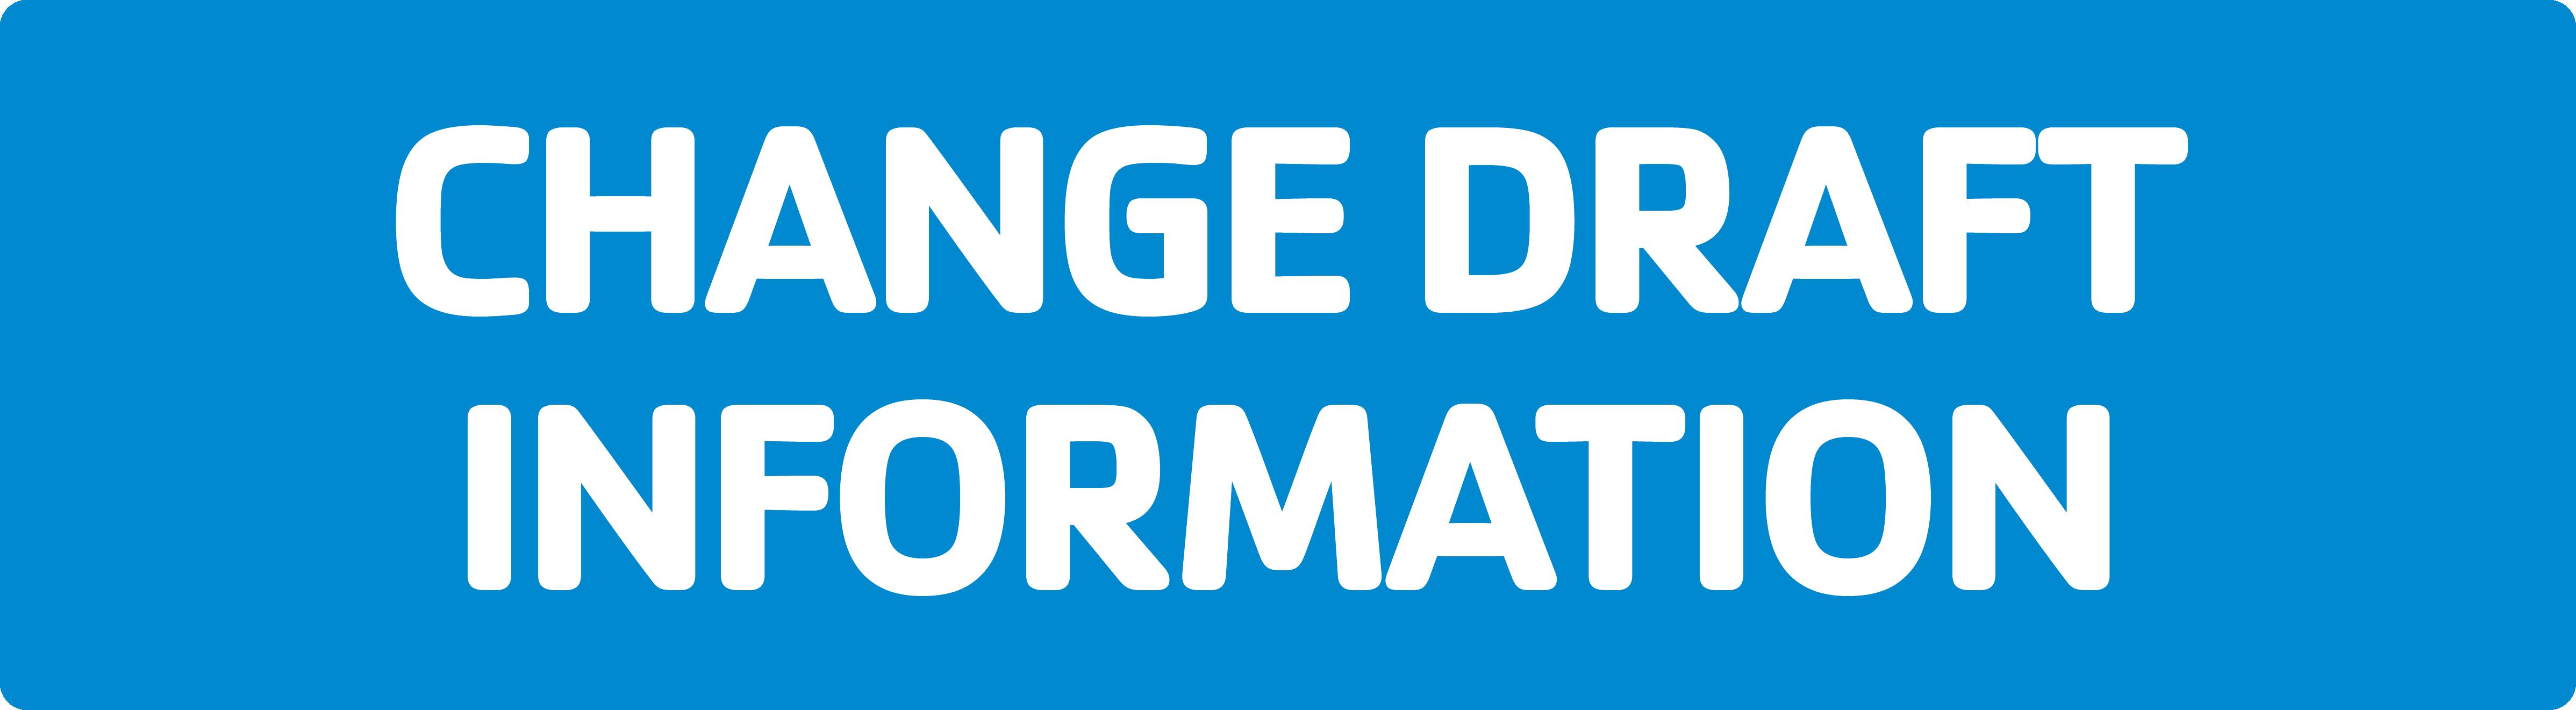 Change Draft Information